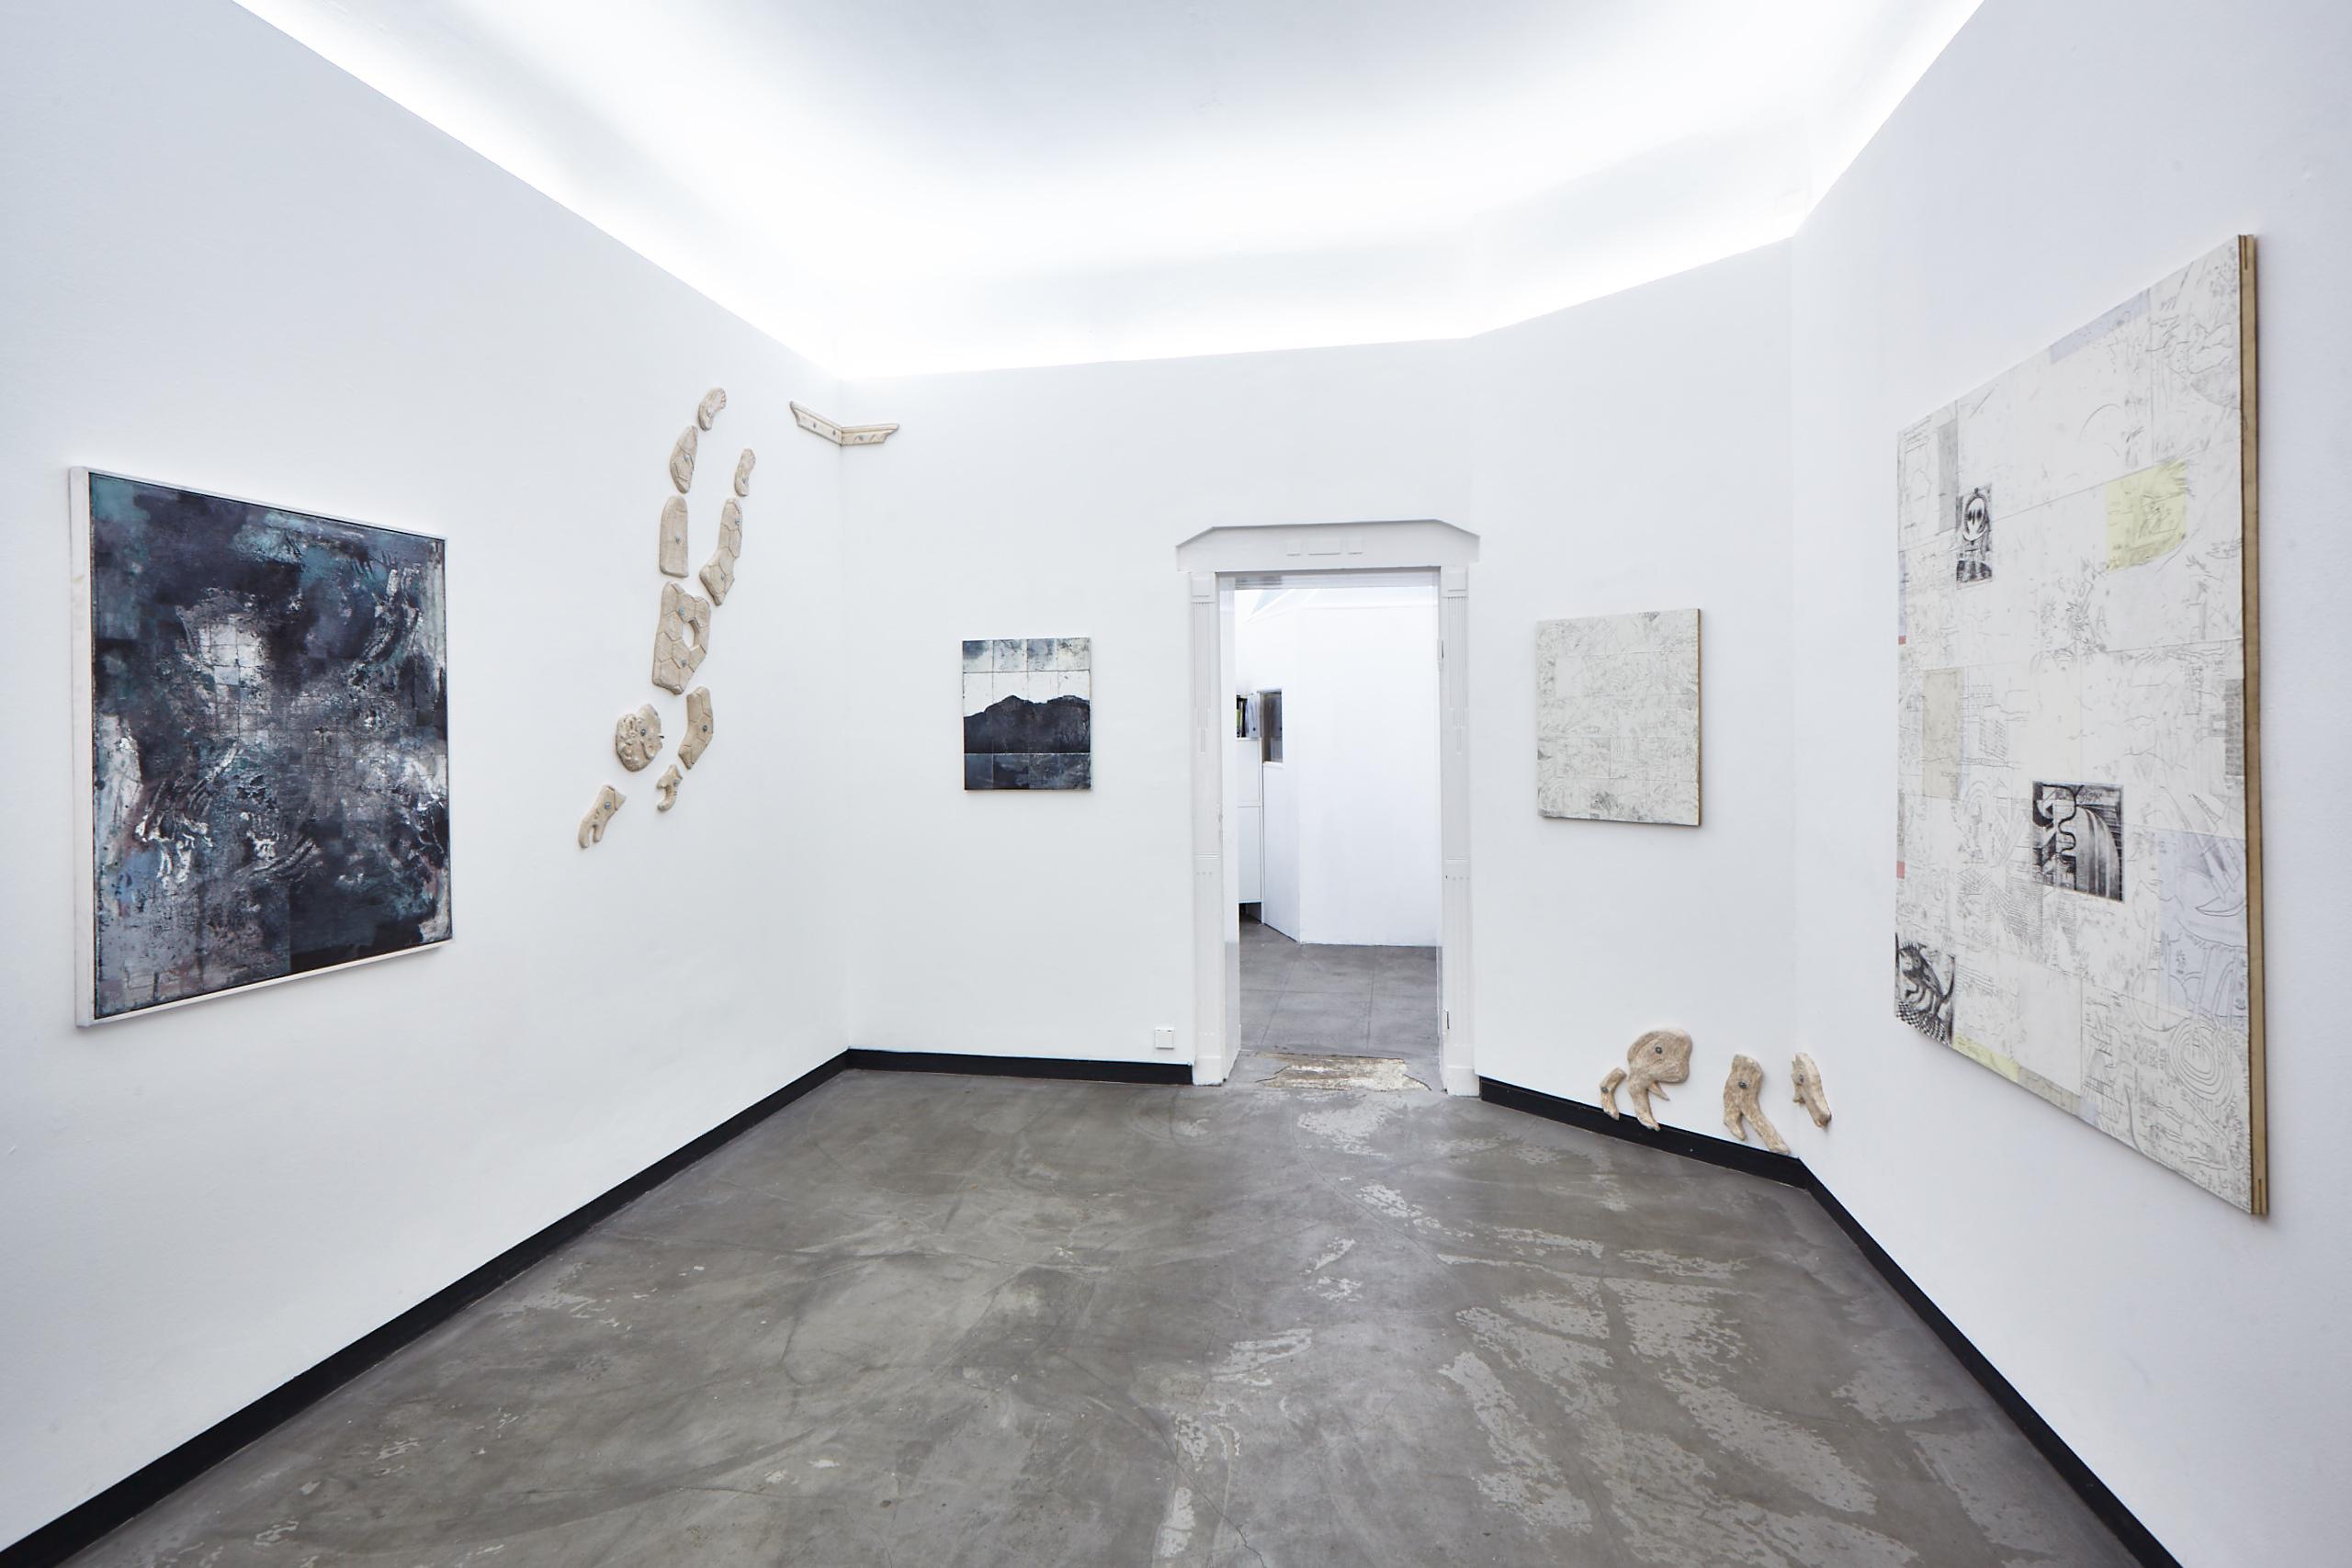 exhibition Event Horizon, sp2 Berlin, Fabian Hub, Lisa Braun, Yannick Riemer